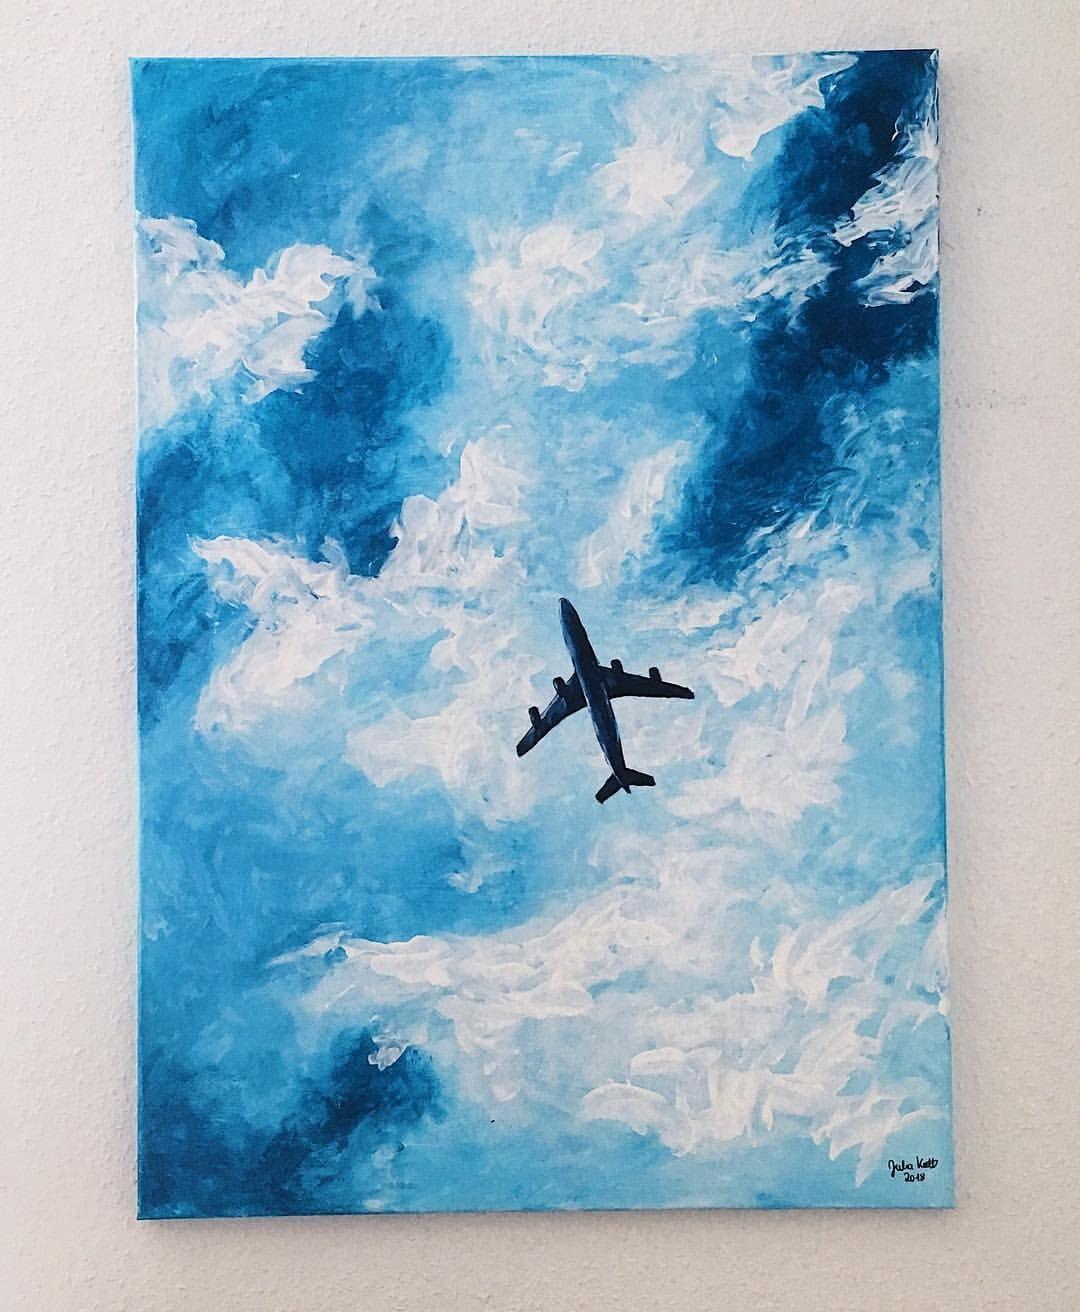 Anmelden Oder Registrieren Um Zu Ansicht In 2020 Sky Art Painting Canvas Art Painting Canvas Drawings